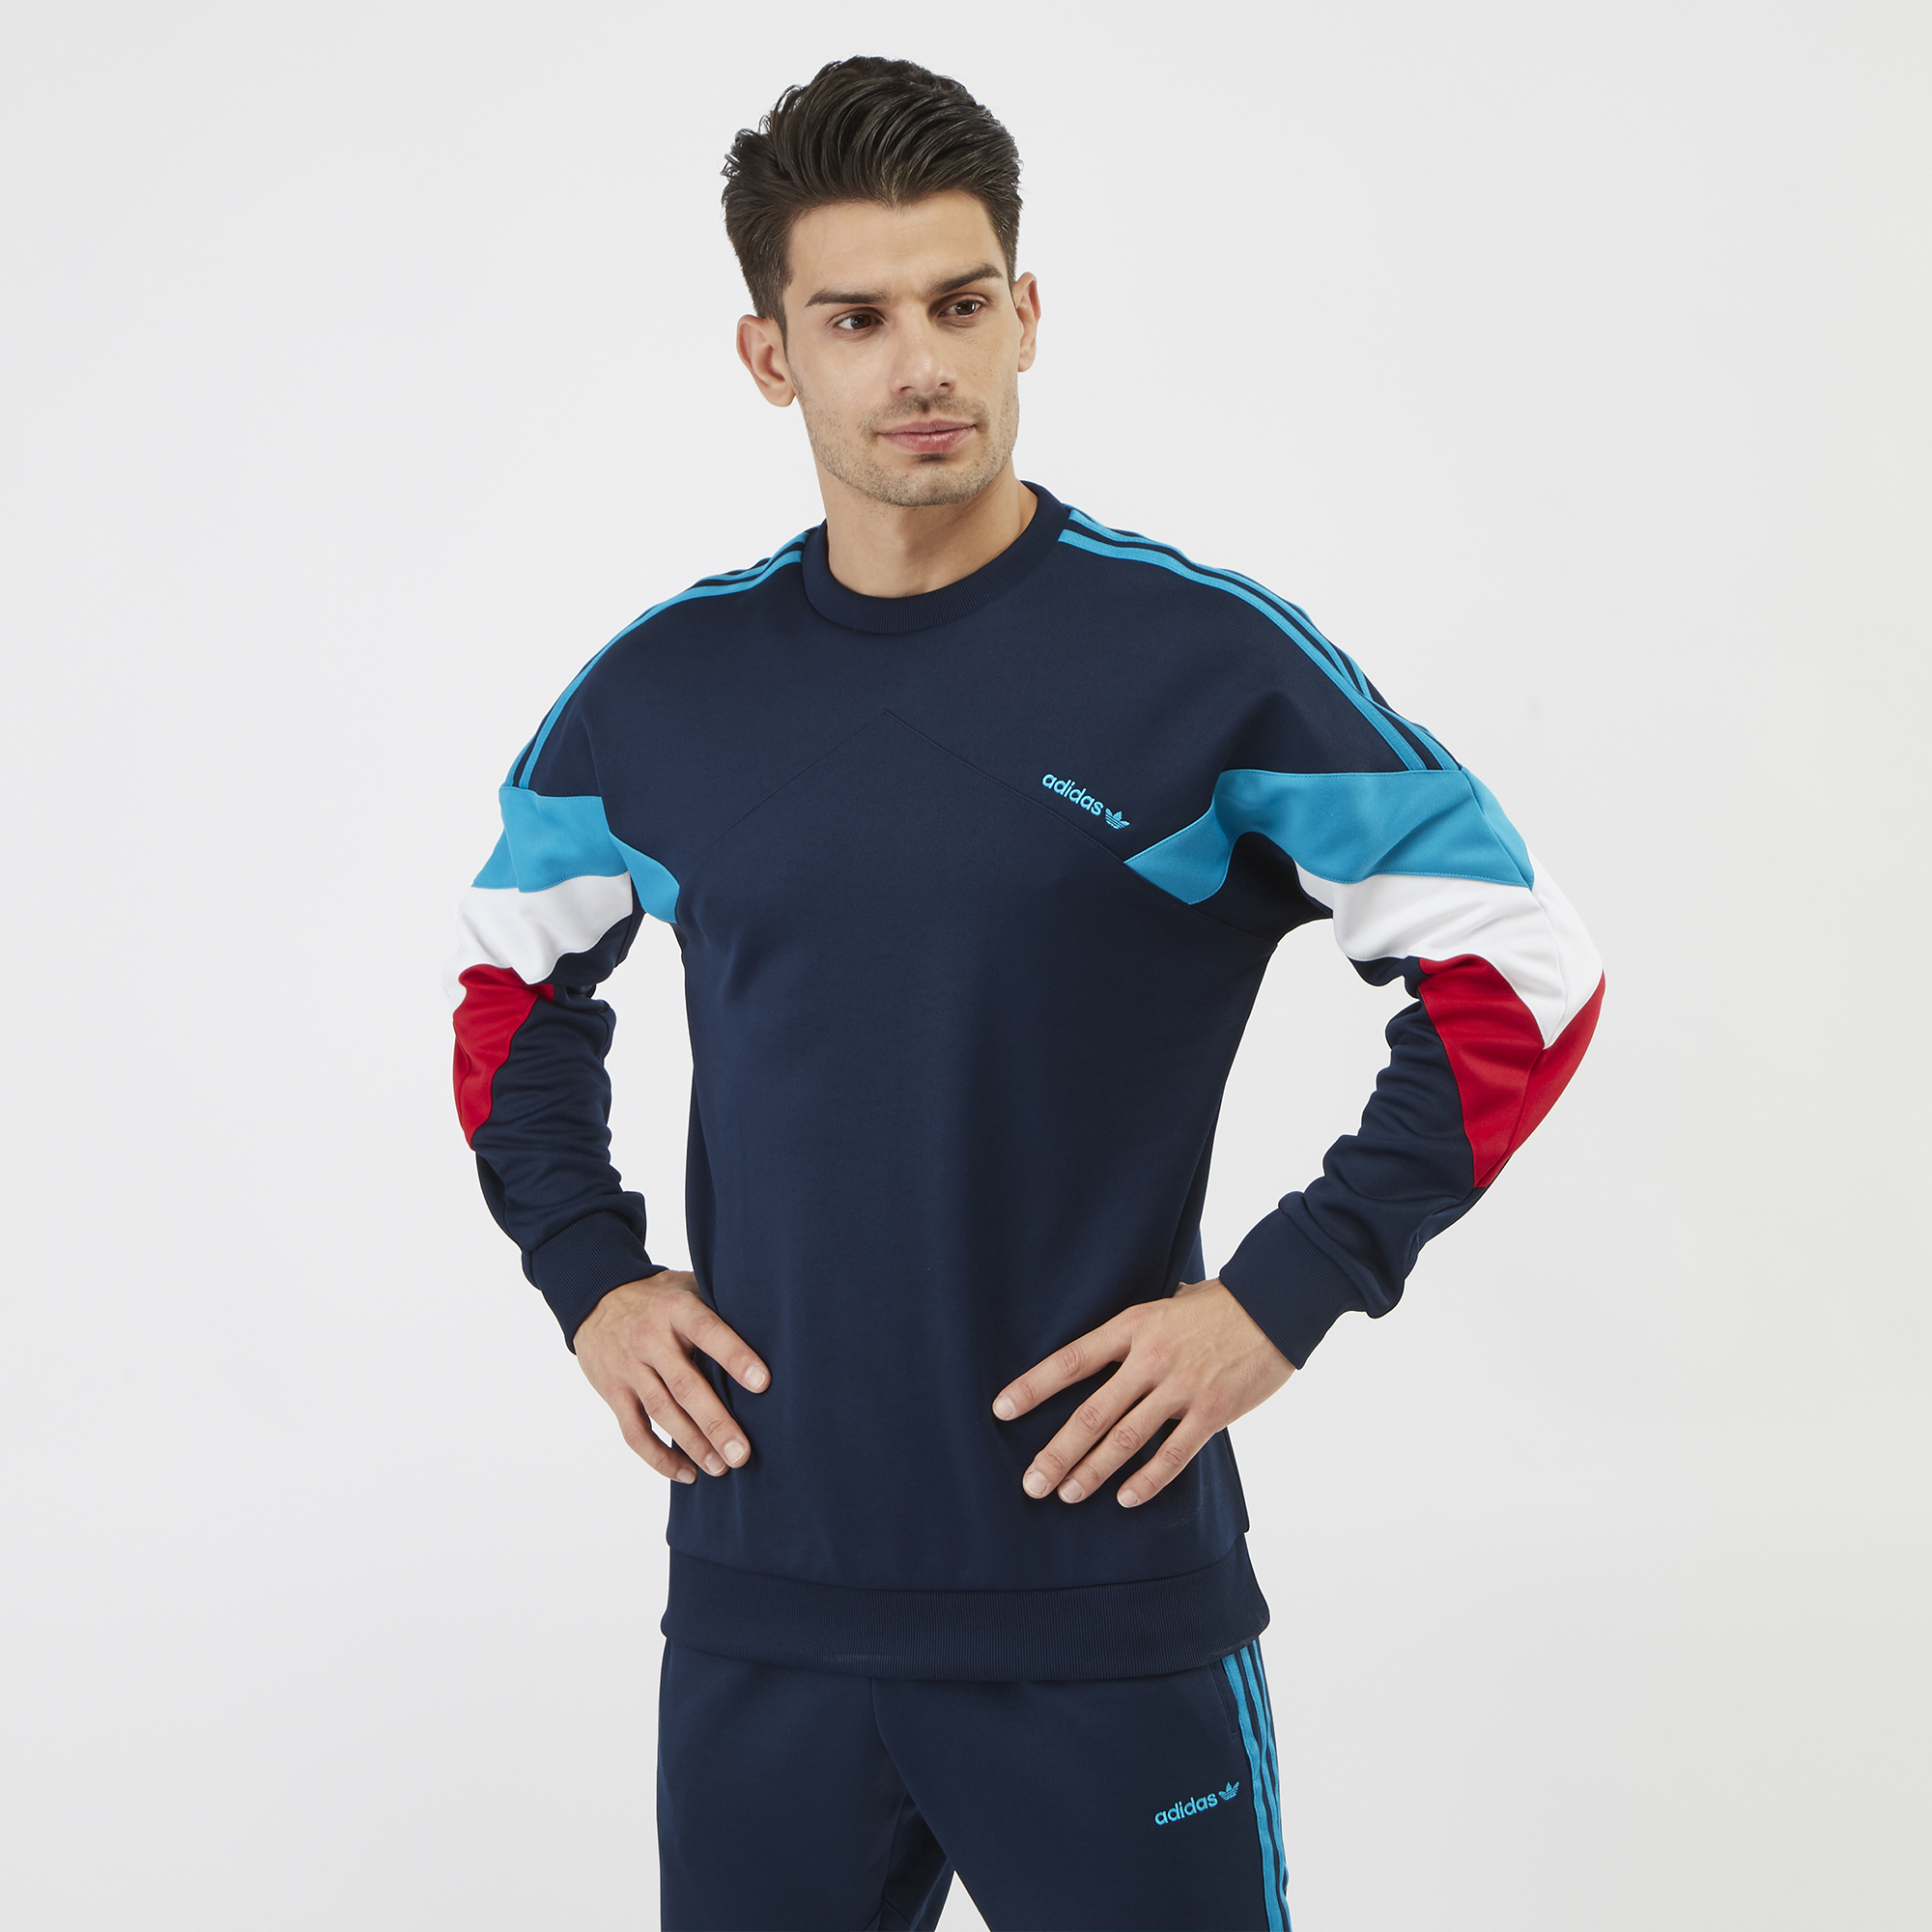 Humedal traqueteo Ceder el paso  adidas Originals Palmeston Sweatshirt | Sweatshirts | Hoodies and  Sweatshirts | Clothing | Mens | SSS